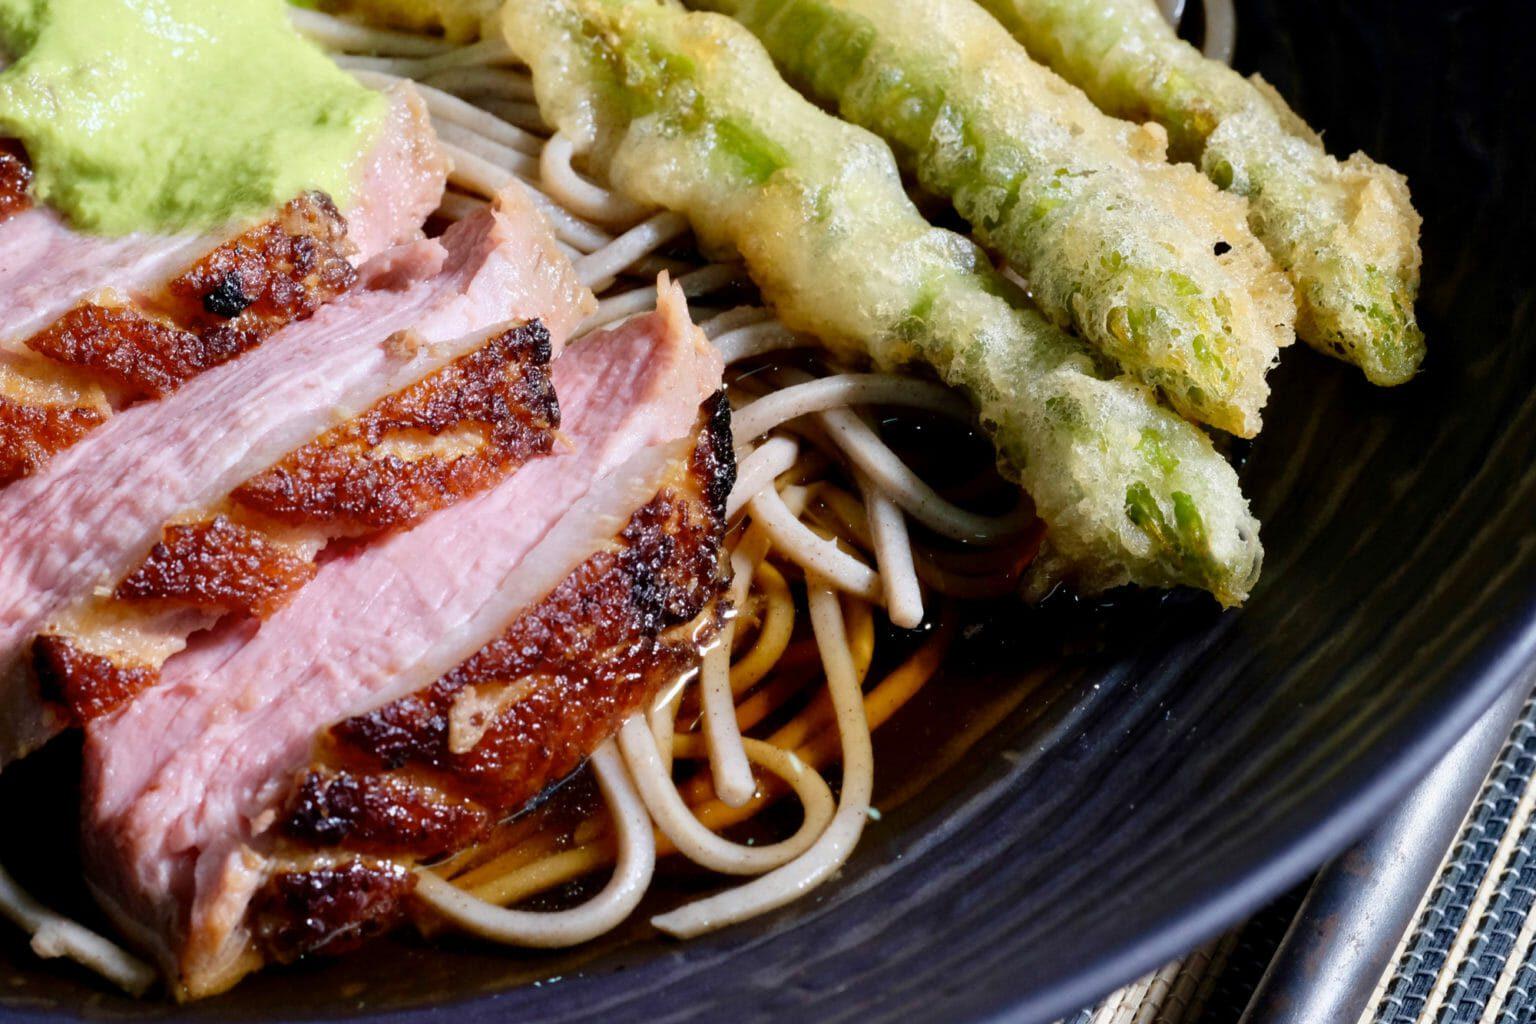 kamo-nanban-crispy-skin-duck-asparagus-tempura-soba-noodles